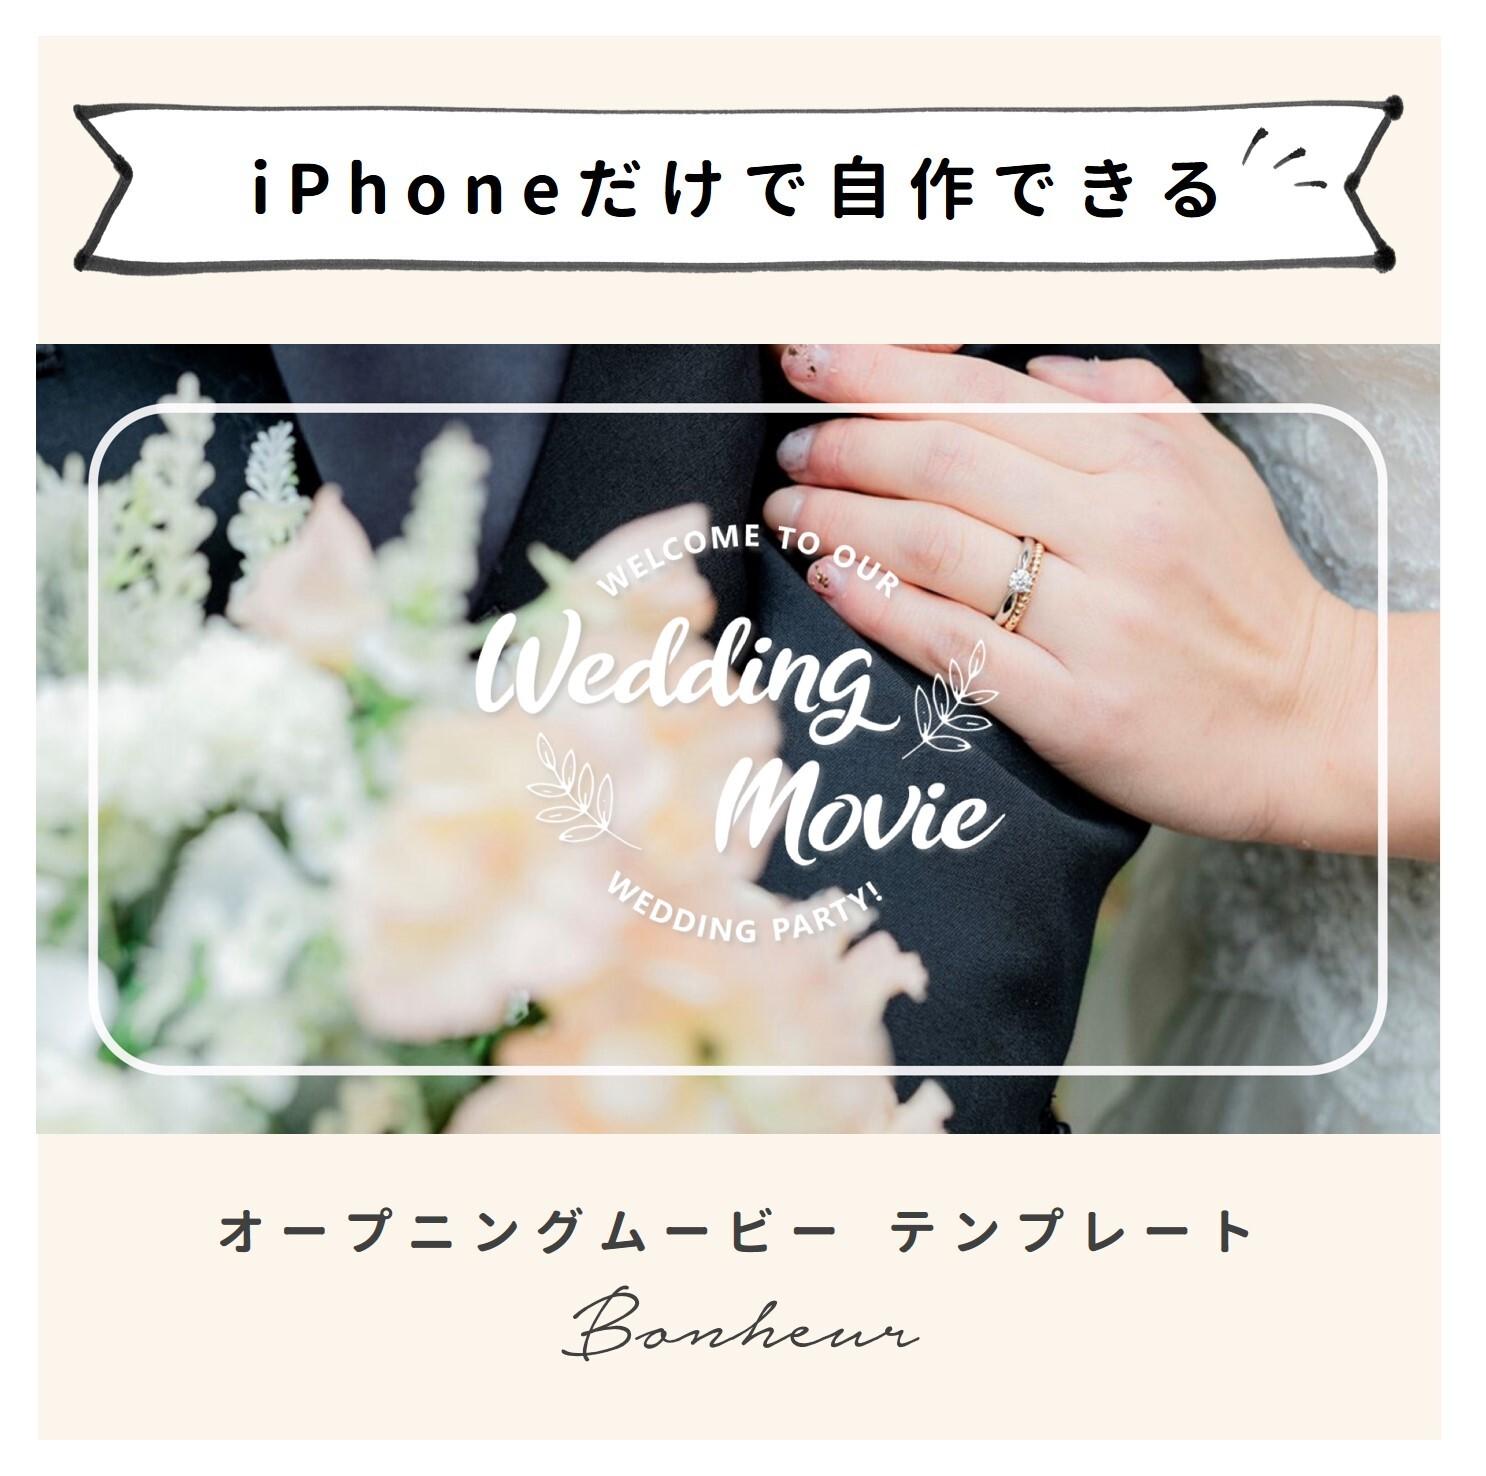 【iPhone用】オープニングムービー「ボヌール」